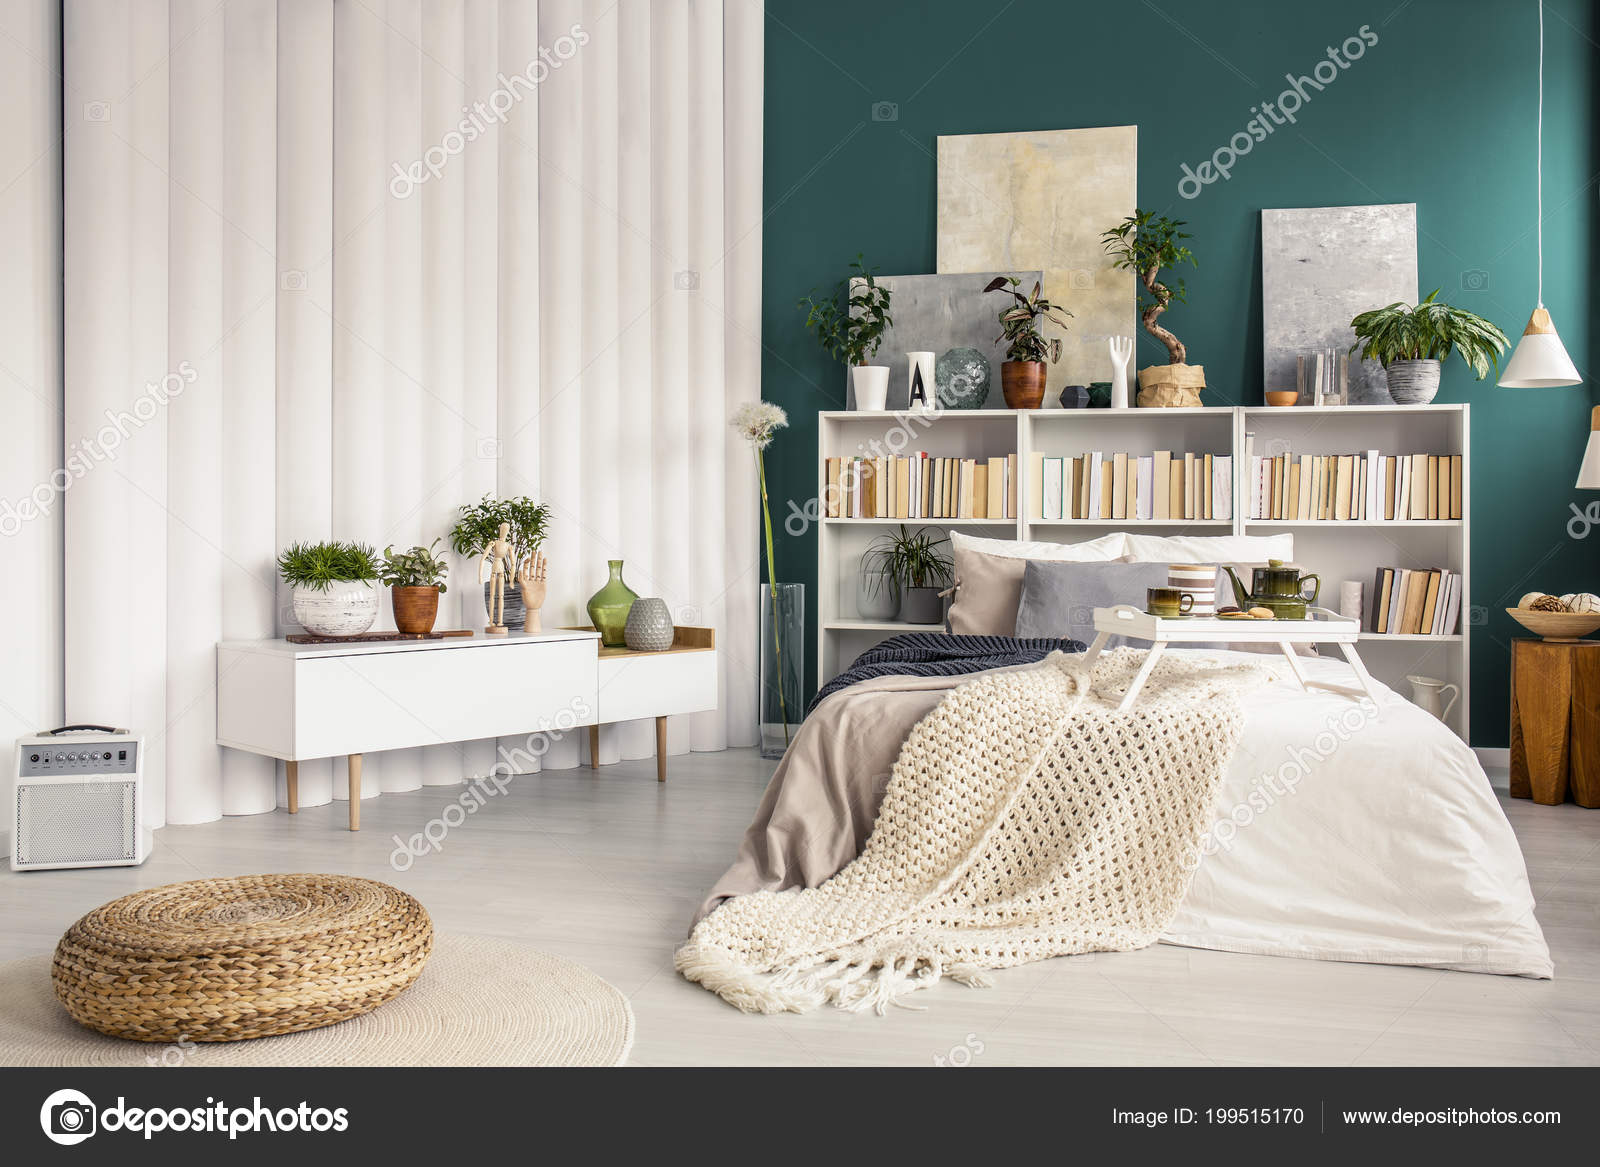 https://st4.depositphotos.com/2249091/19951/i/1600/depositphotos_199515170-stockafbeelding-moderne-slaapkamer-interieur-met-turquoise.jpg